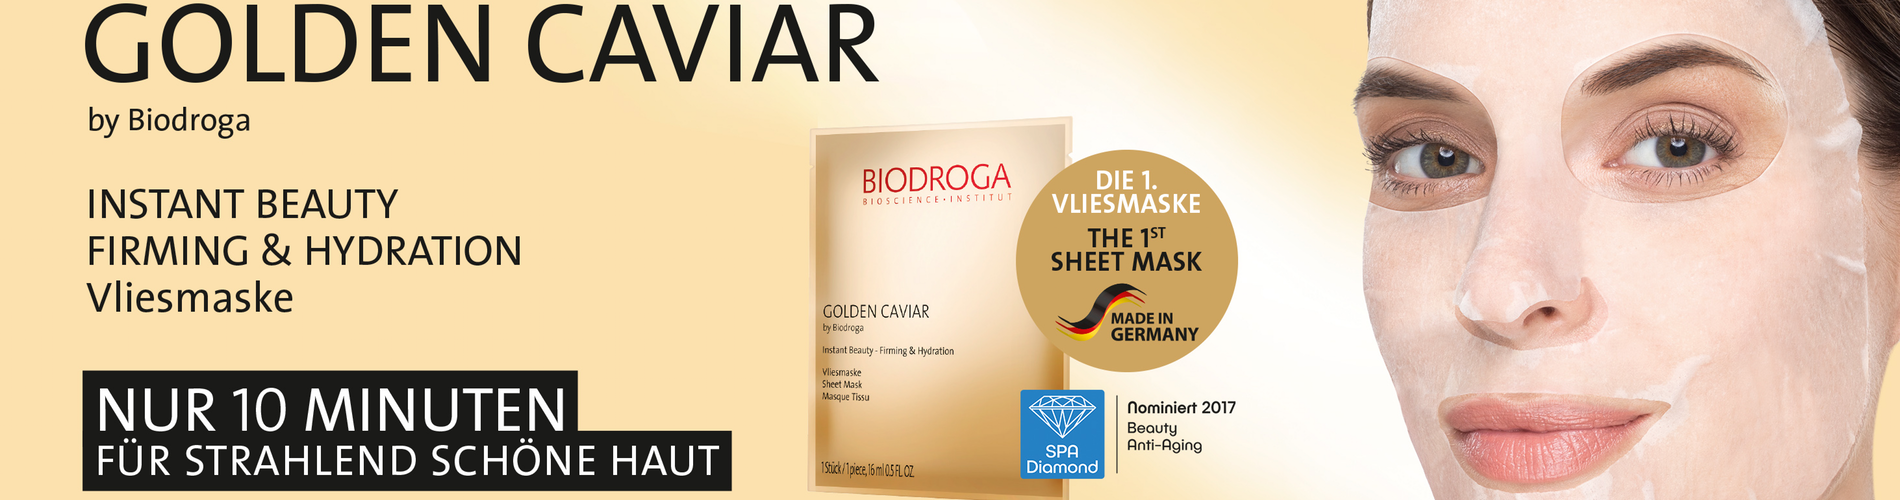 Лифтинг маска Biodroga